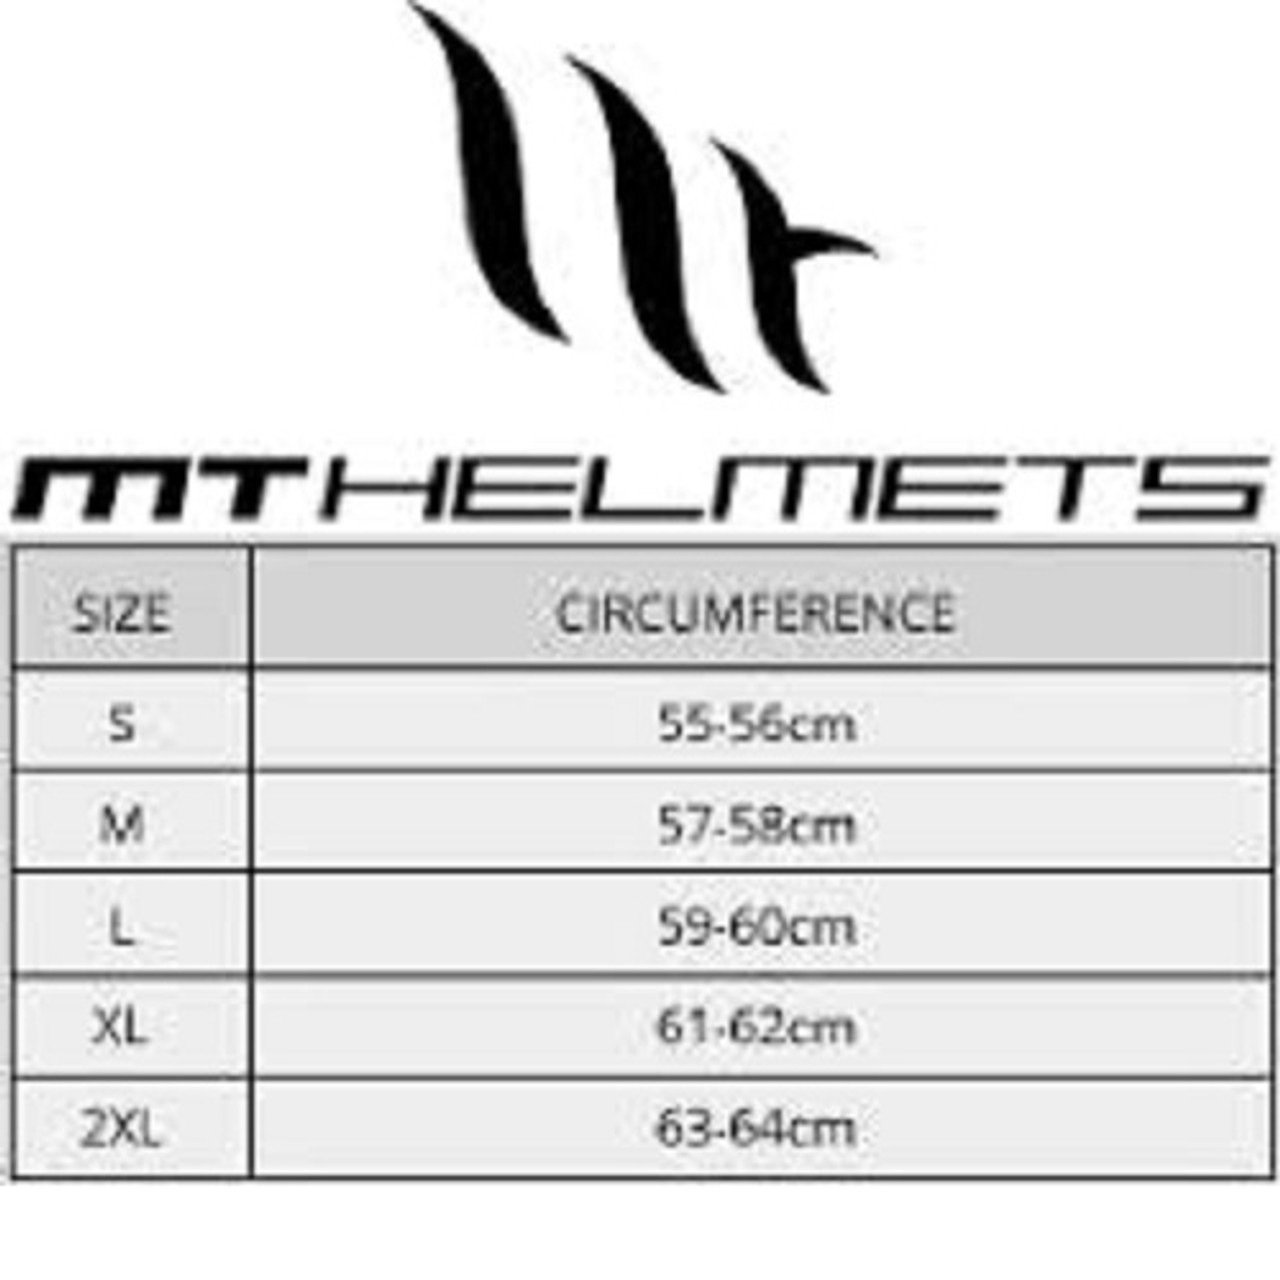 MT Jet Street Motorcycle / Scooter Open Face Helmet, Matt Black